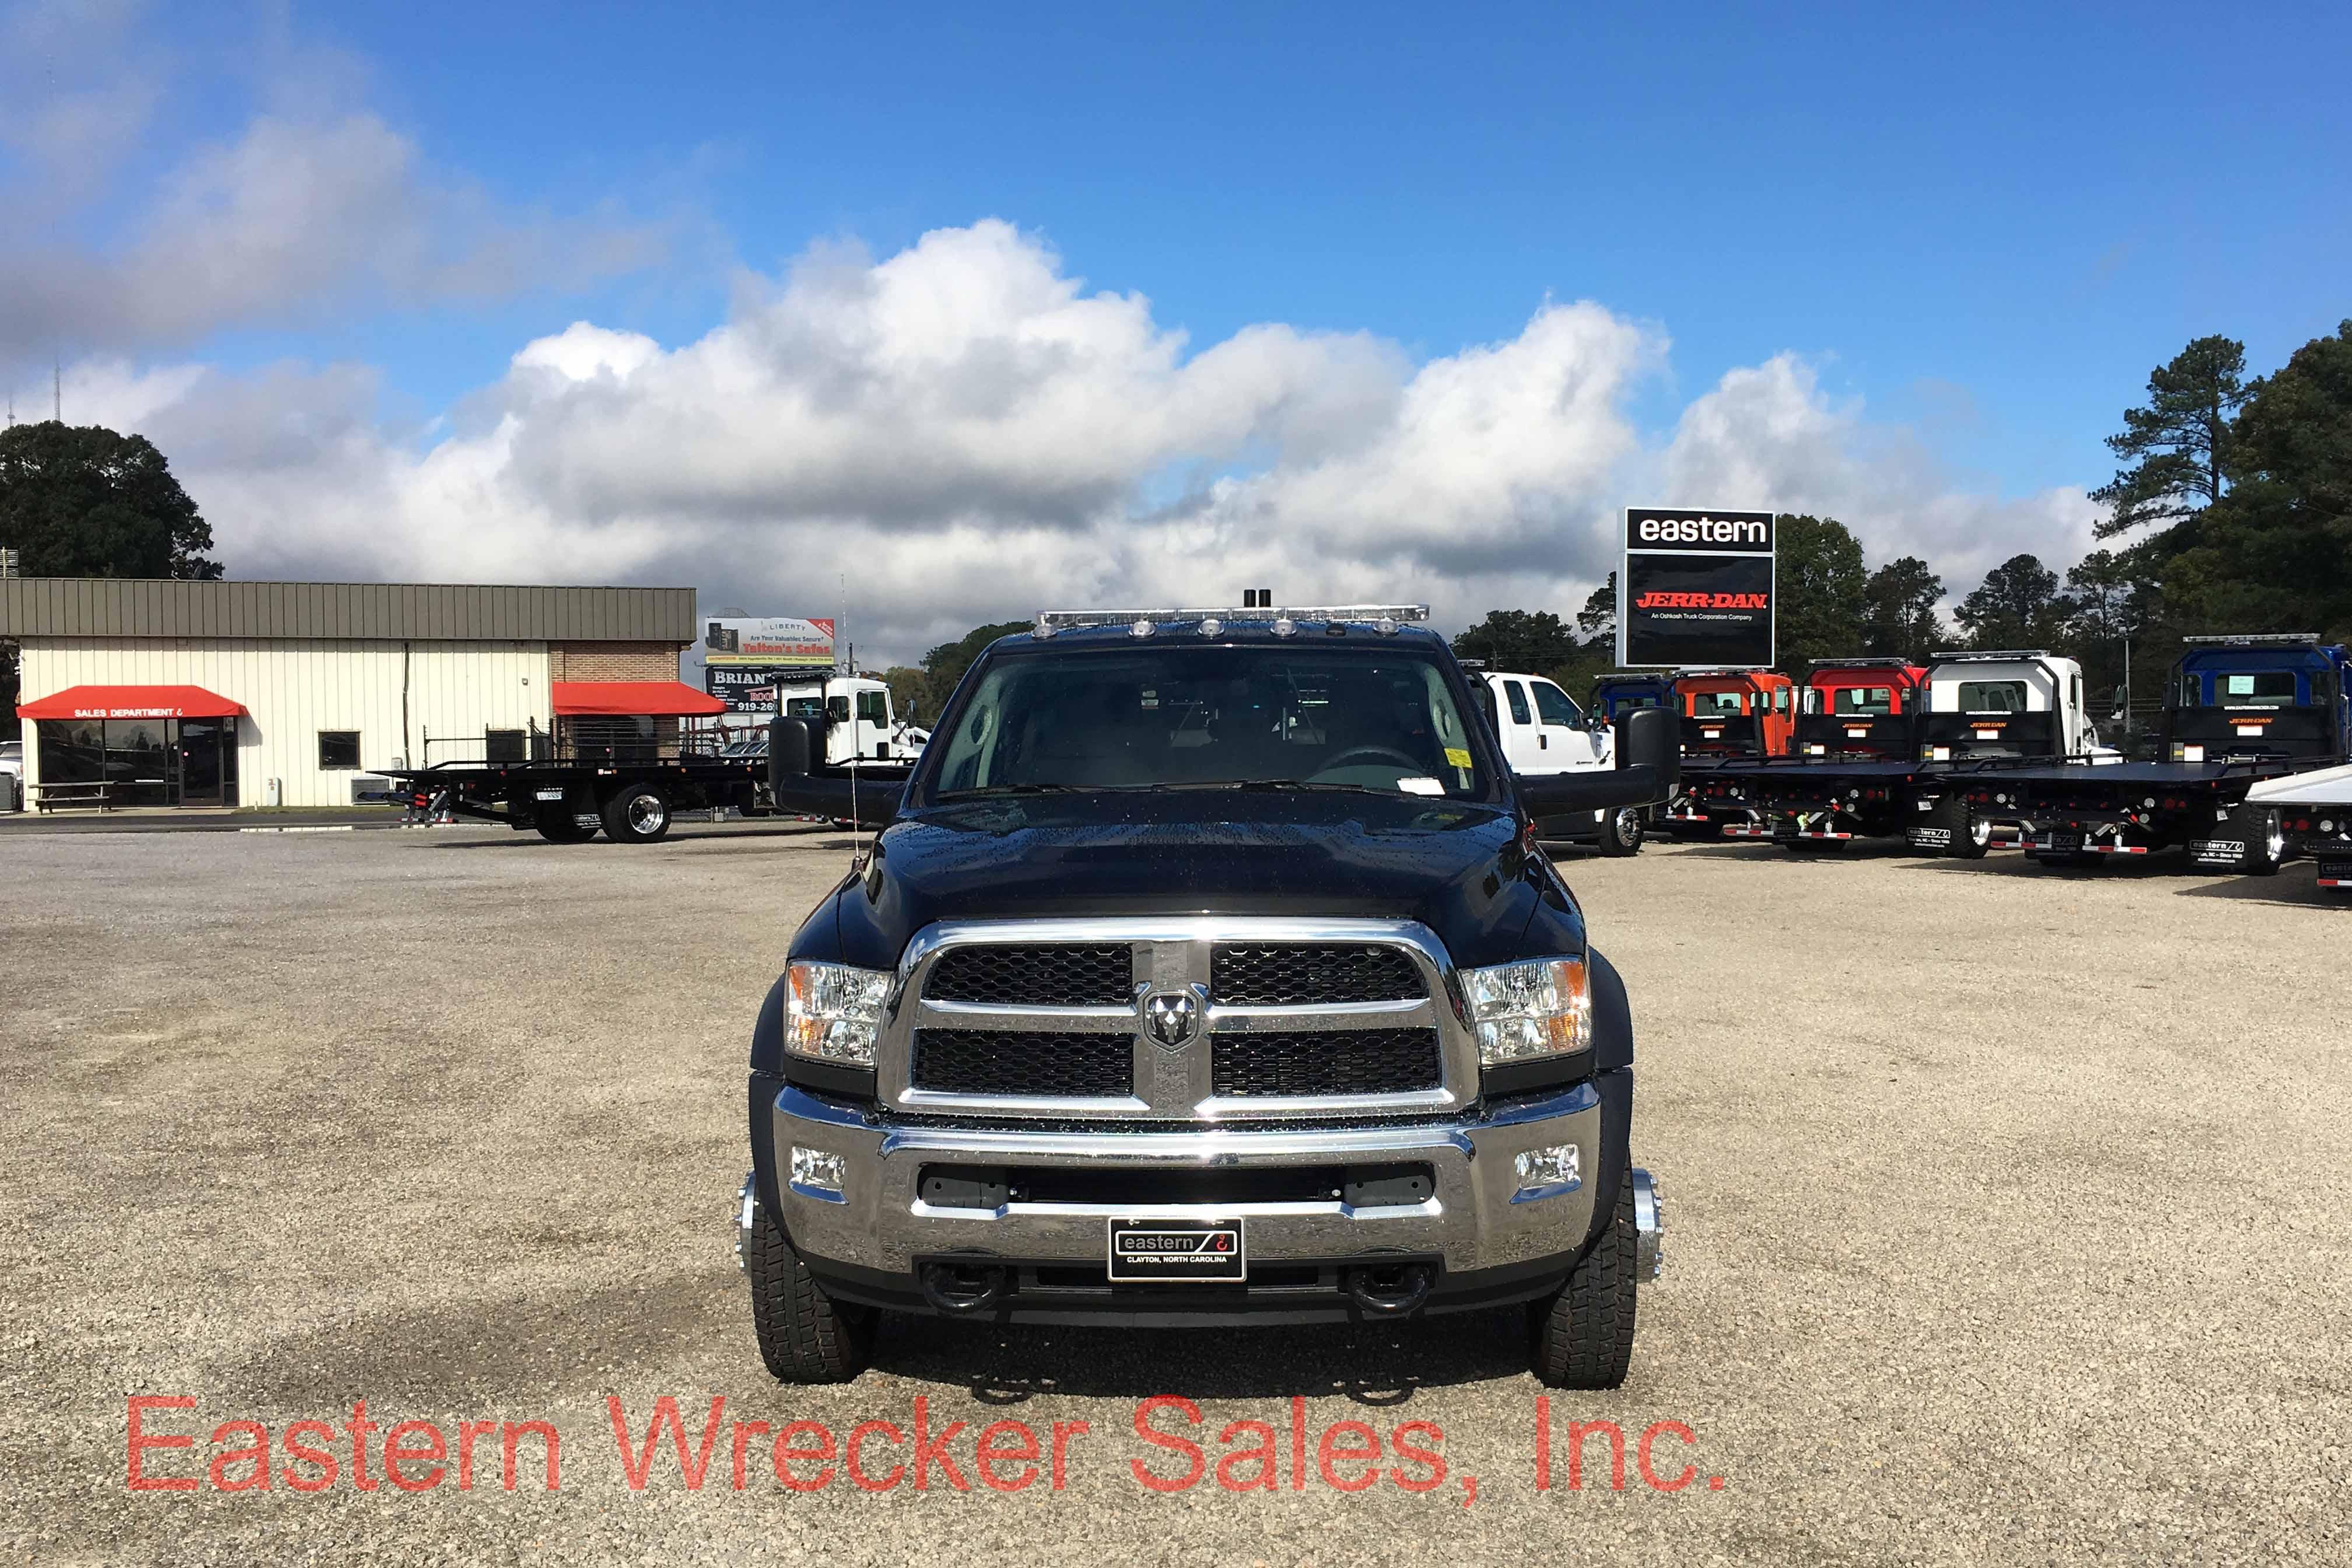 D1395 Front Dodge 5500 Tow Truck For Sale Jerr Dan Mpl40